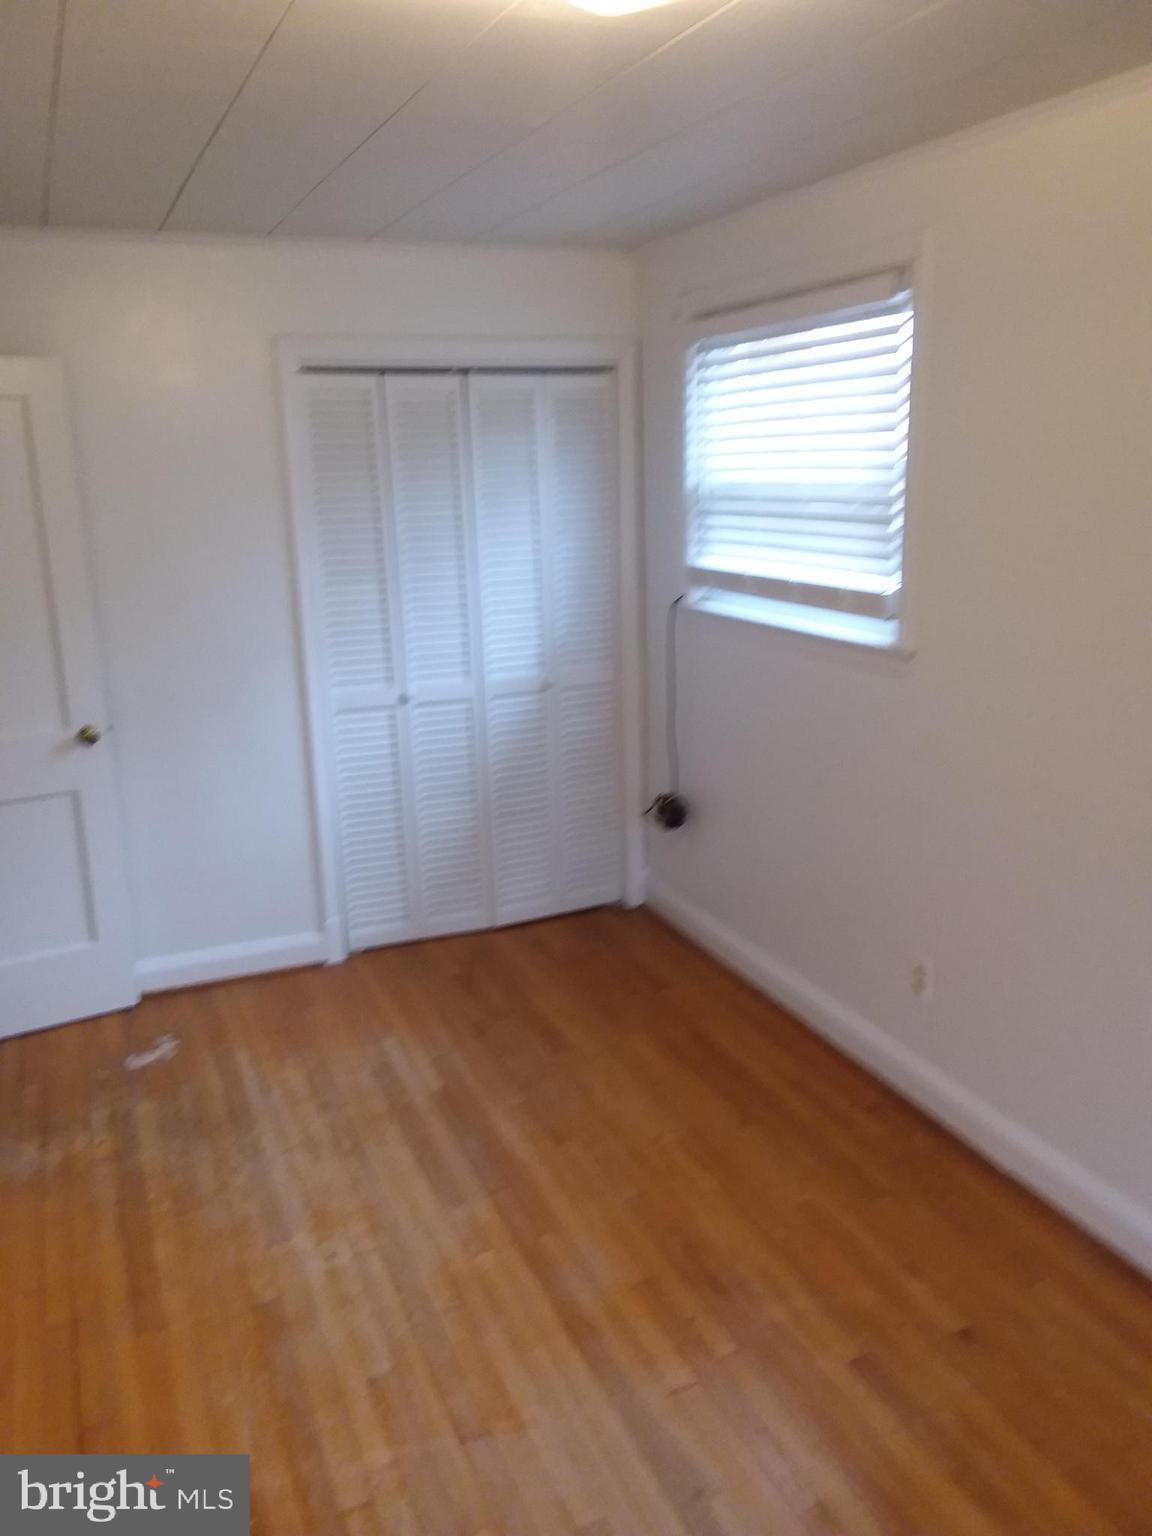 1415 DARTMOUTH AVENUE, Parkville, Maryland 21234, 3 Bedrooms Bedrooms, ,2 BathroomsBathrooms,Townhouse,For Sale,1415 DARTMOUTH AVENUE,MDBC525364